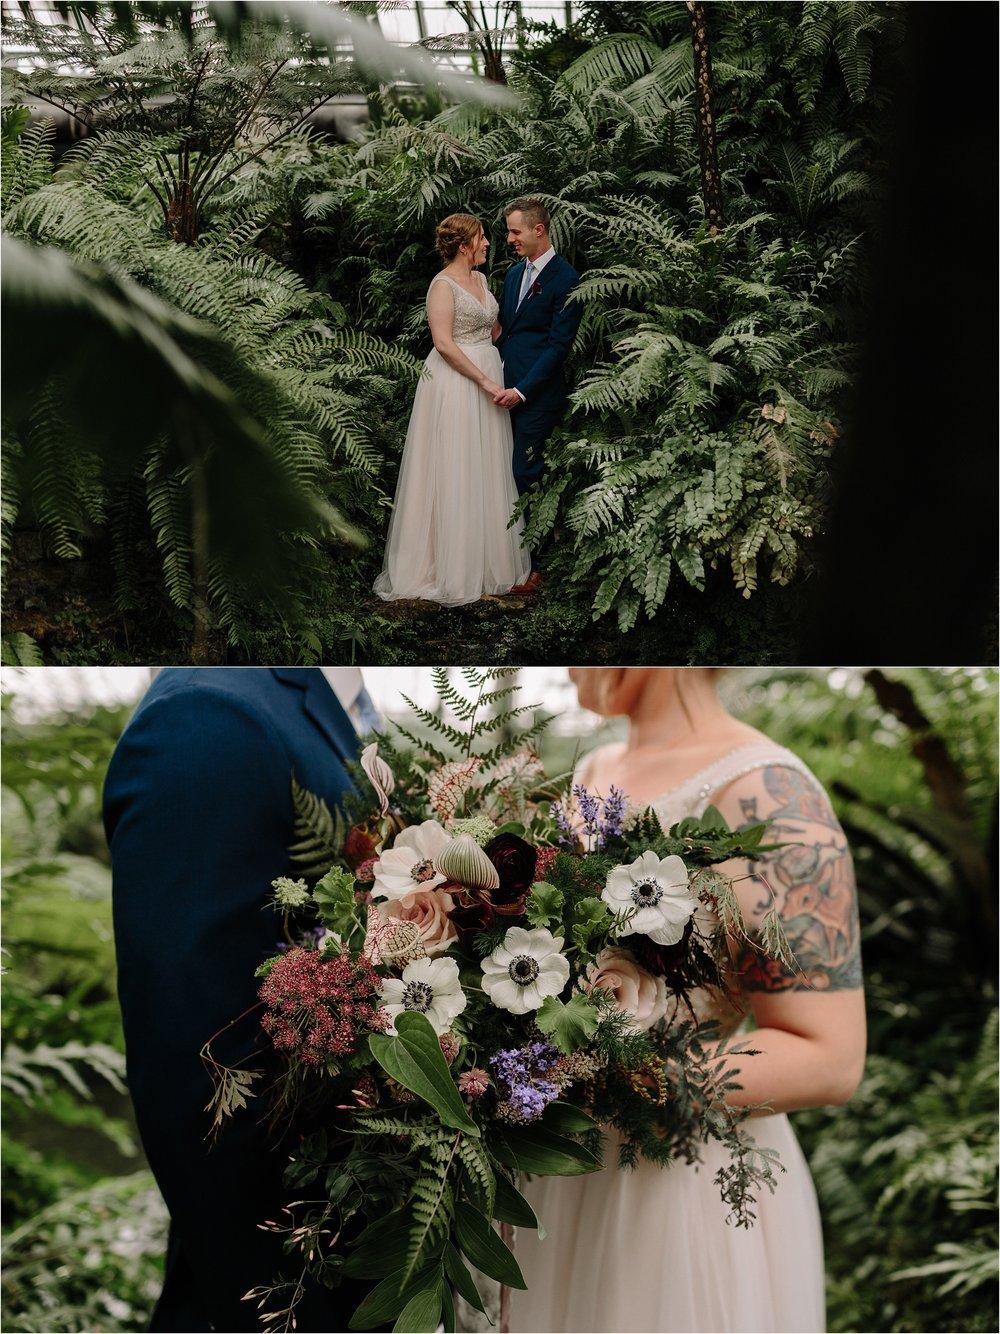 garfield-park-conservatory-wedding-118.jpg